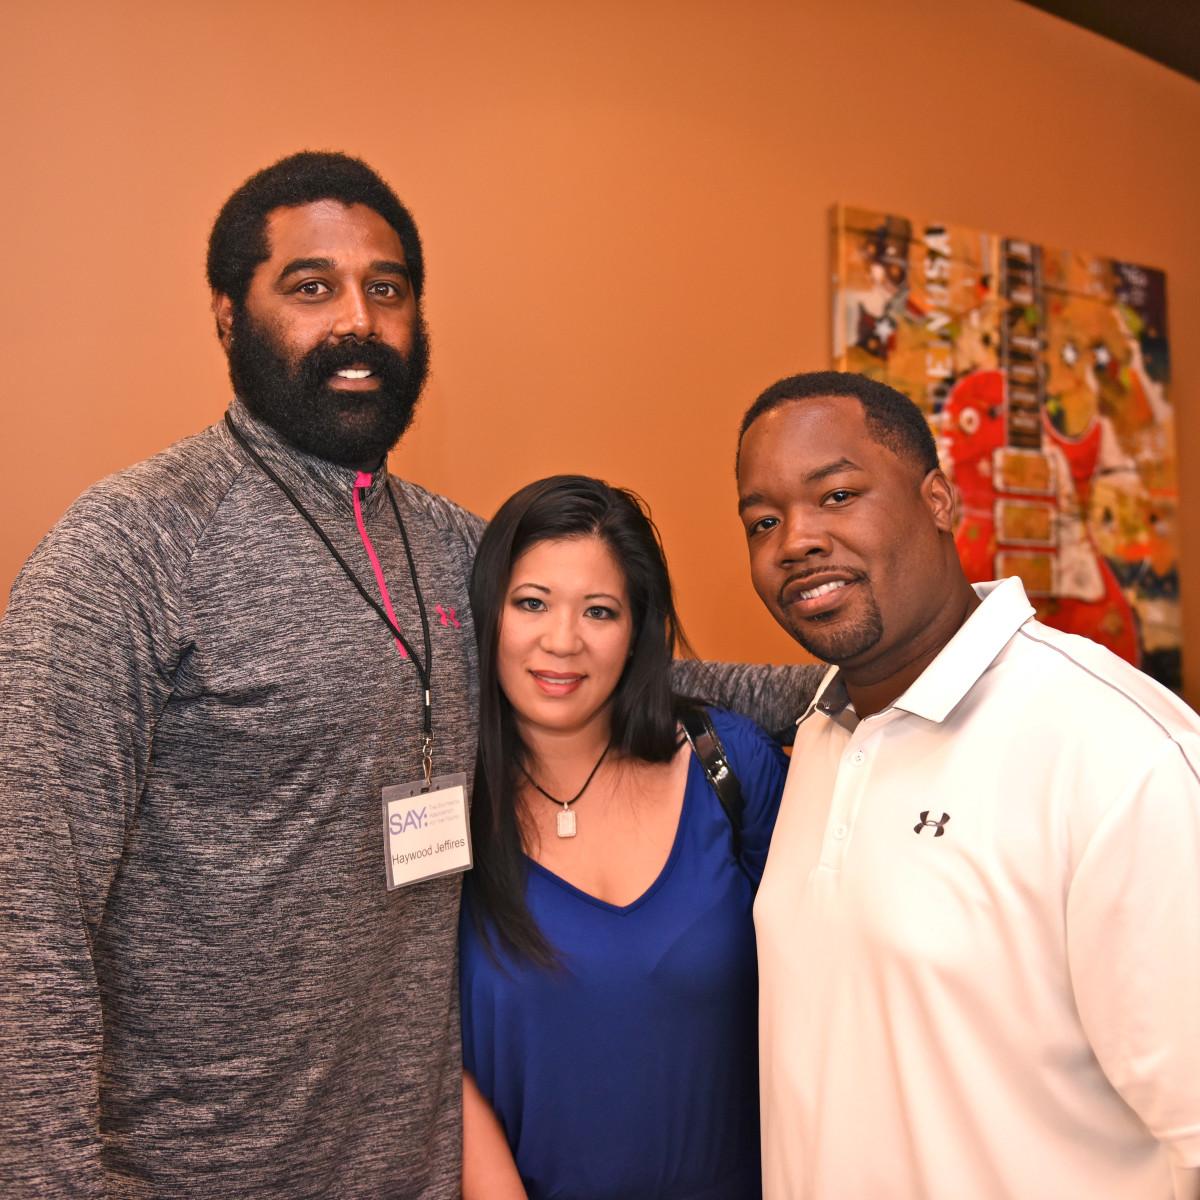 Houston, George Springer All-Star Bowling Benefit, July 2015, Haywood Jeffries, Lisa Velasquez, Rob Sammons